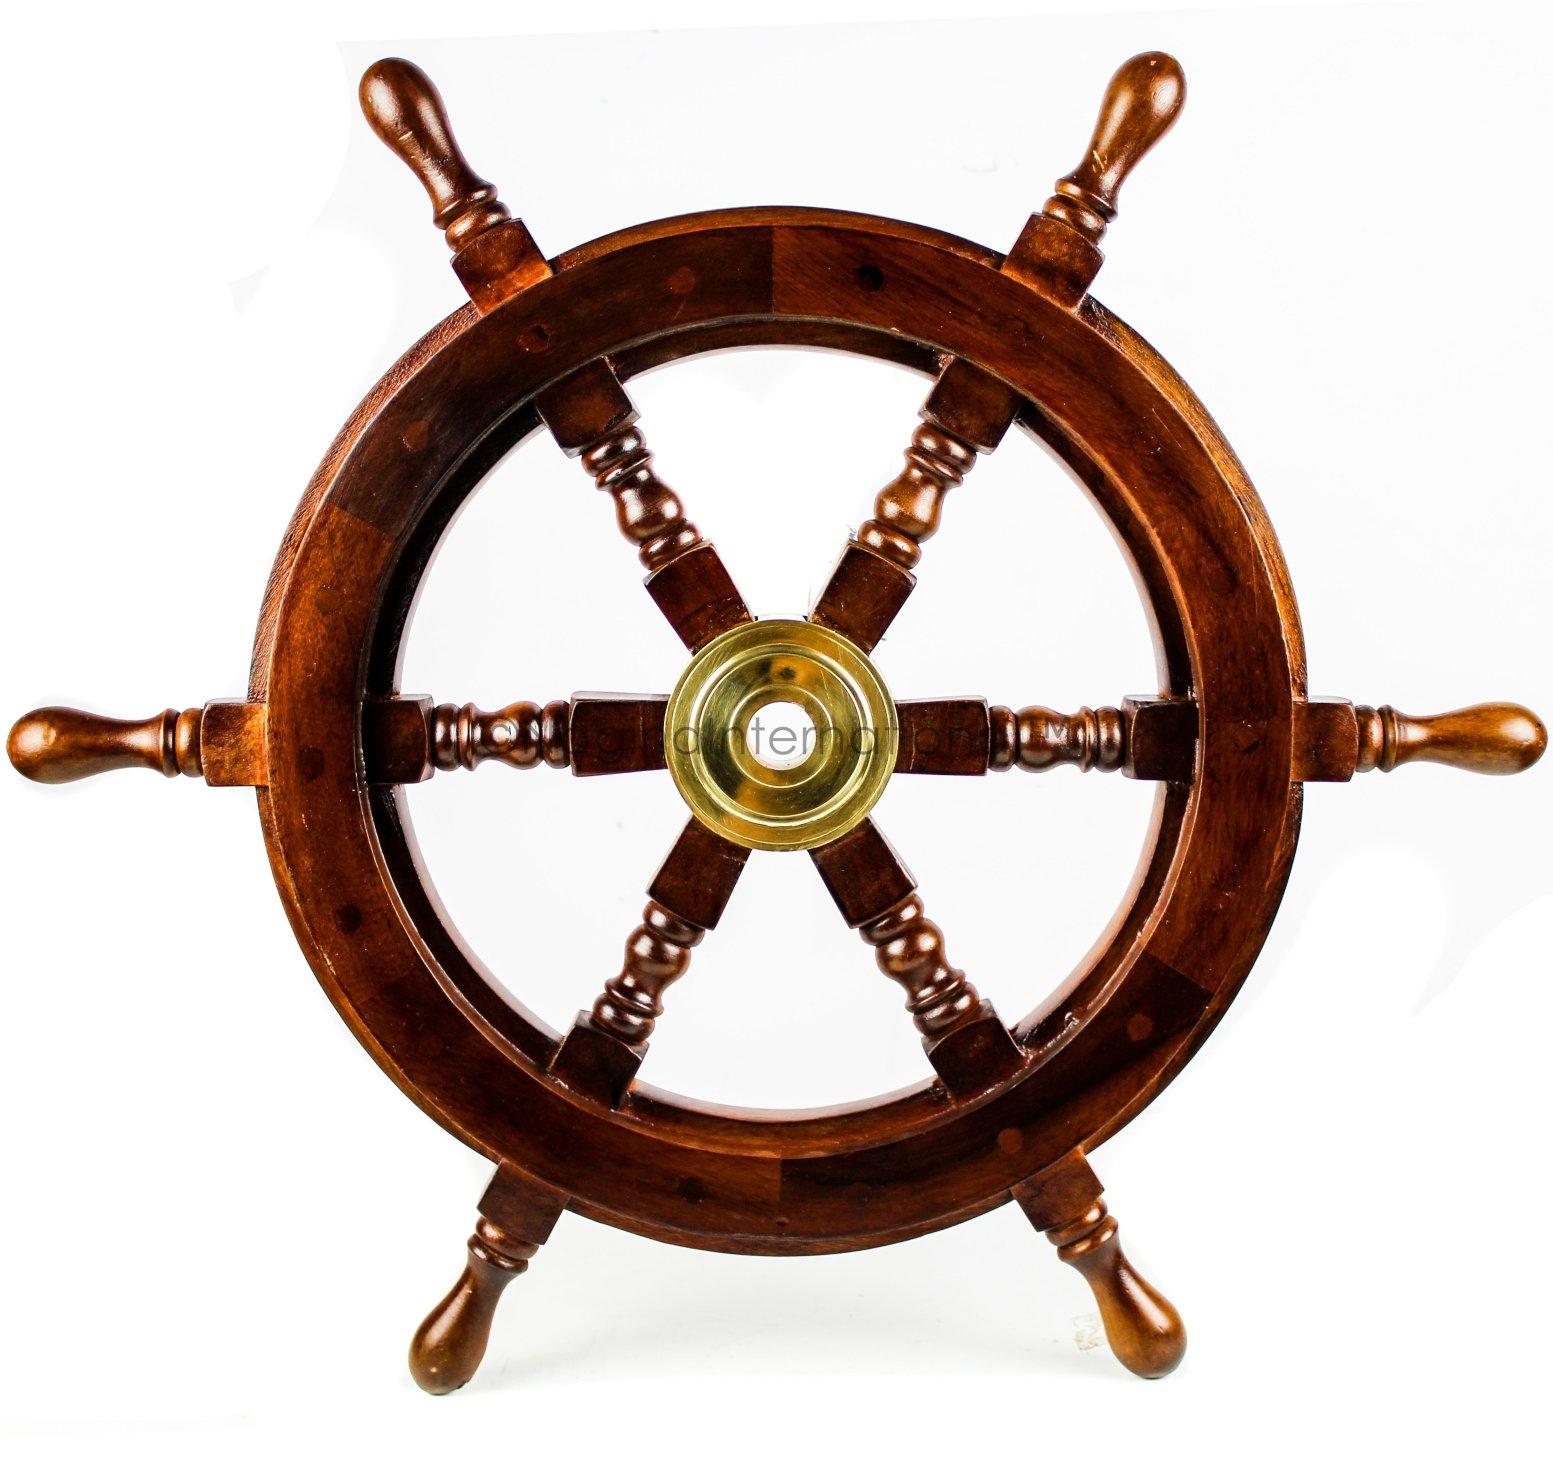 Premium Nautical Handcrafted Wooden Ship Wheel | Pirate's Wall Home Decor & Gifts | Nagina International (42 Inches, Dark Rosewood) by Nagina International